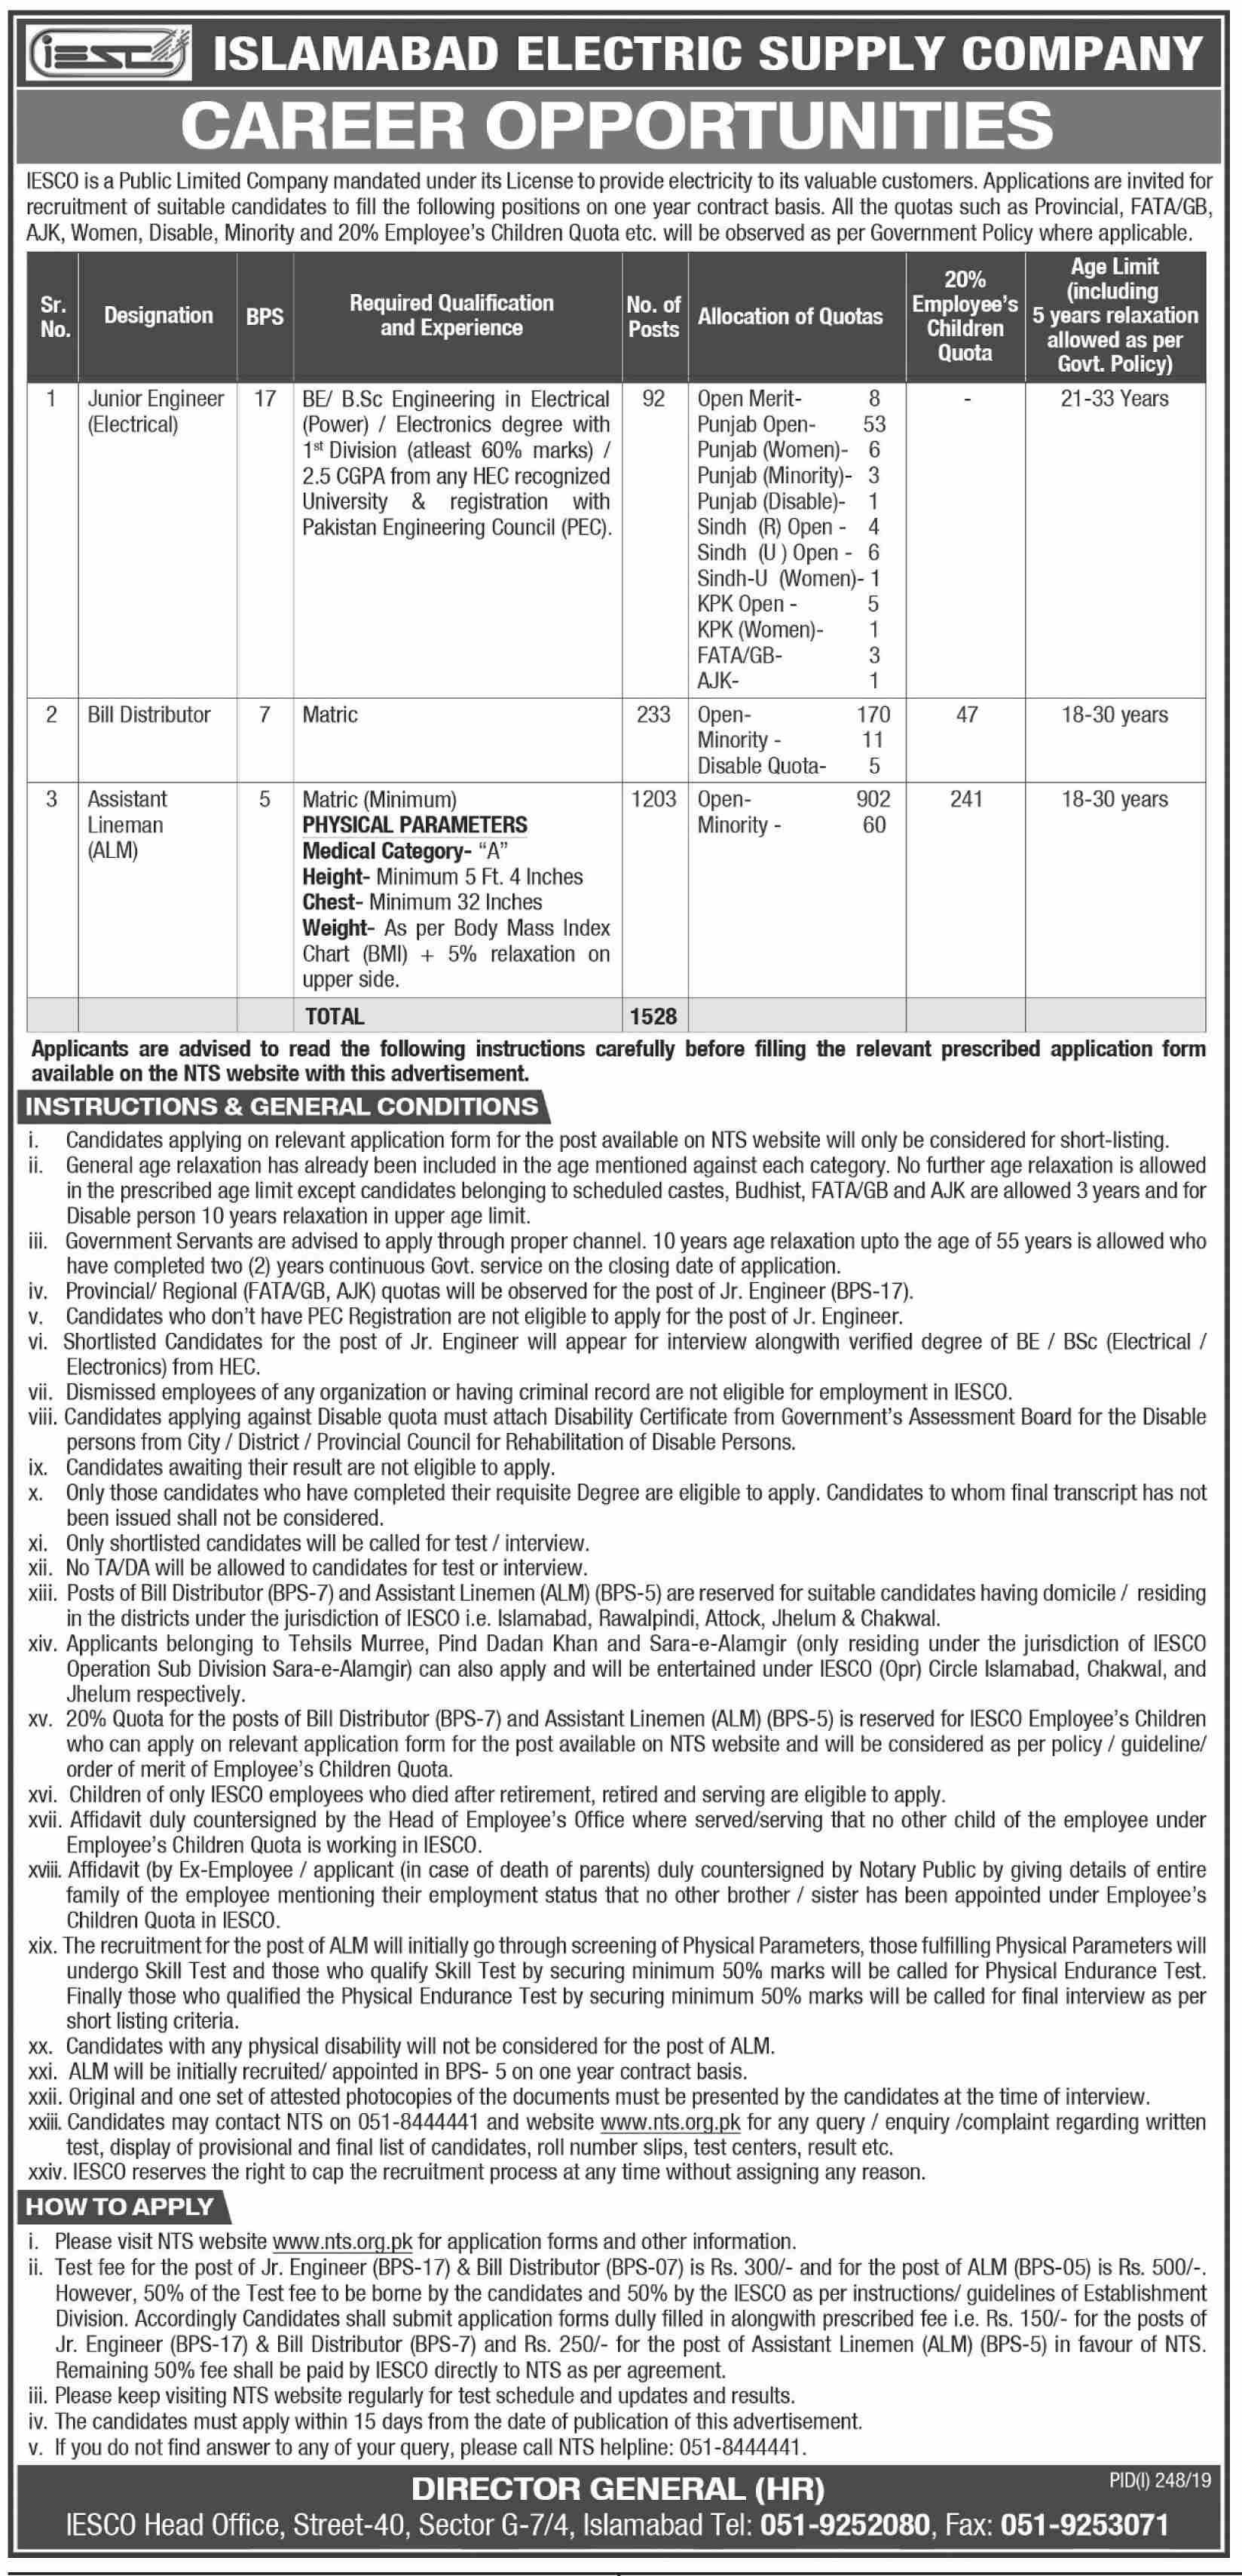 Islamabad Electric Supply Company IESCO Jobs 2019